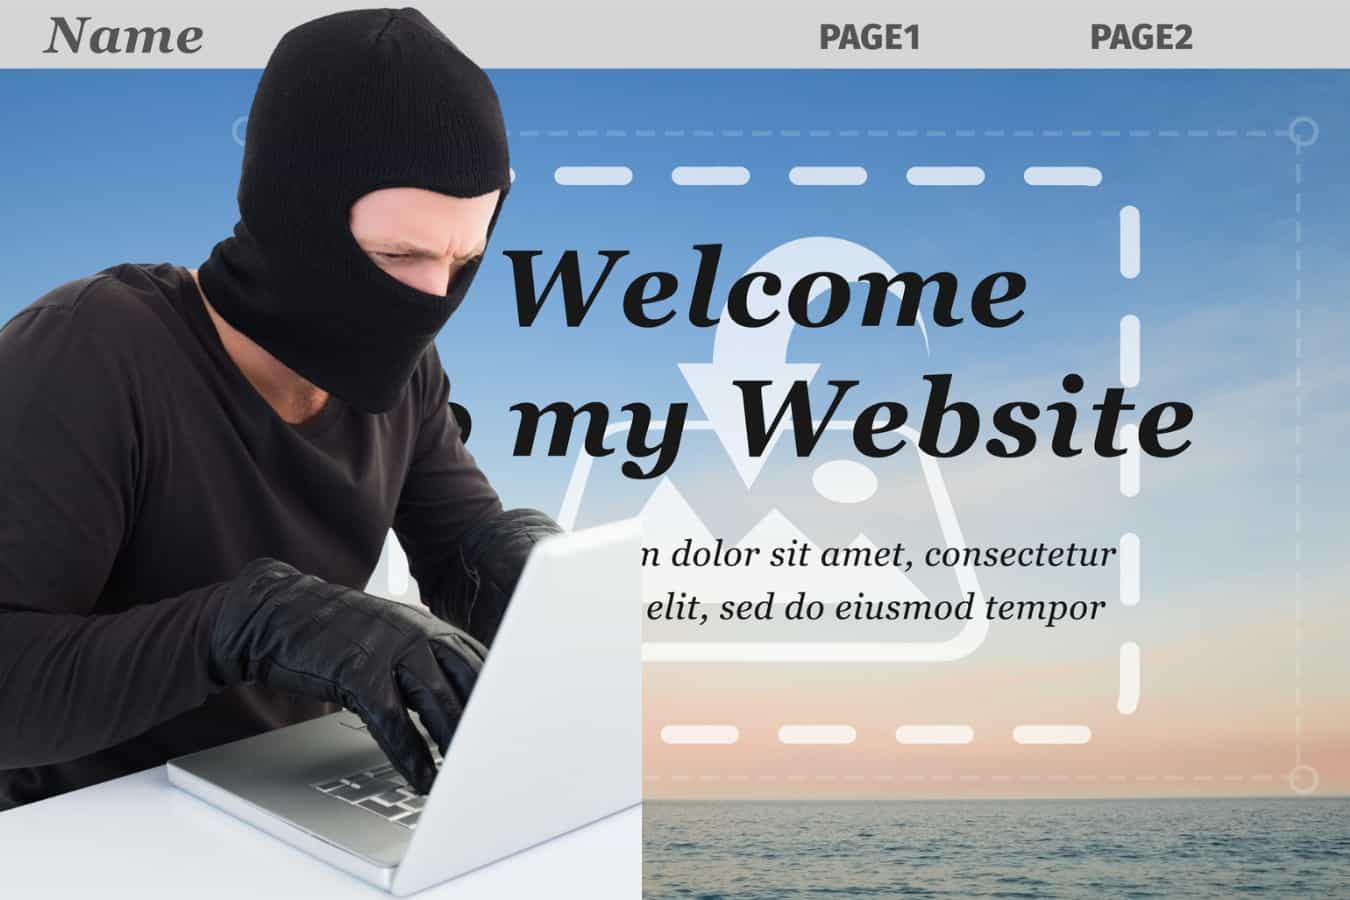 selling your website is dangerous